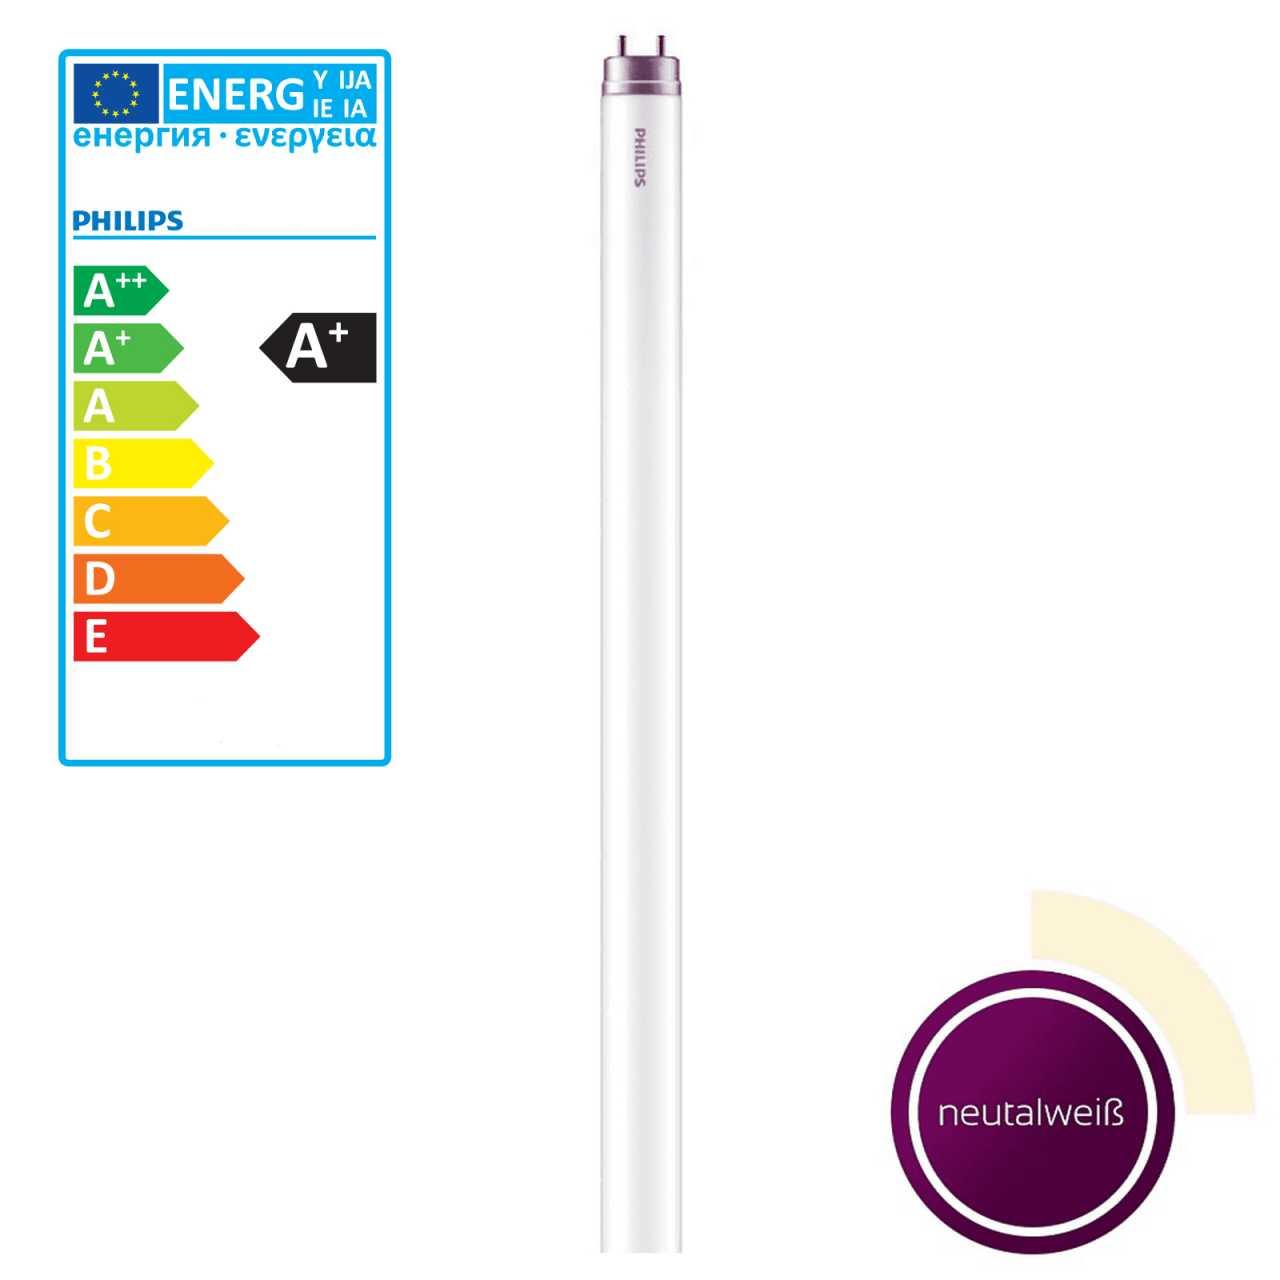 Philips LED Stabförmige Röhre 20 Watt G13 Neutralweiß